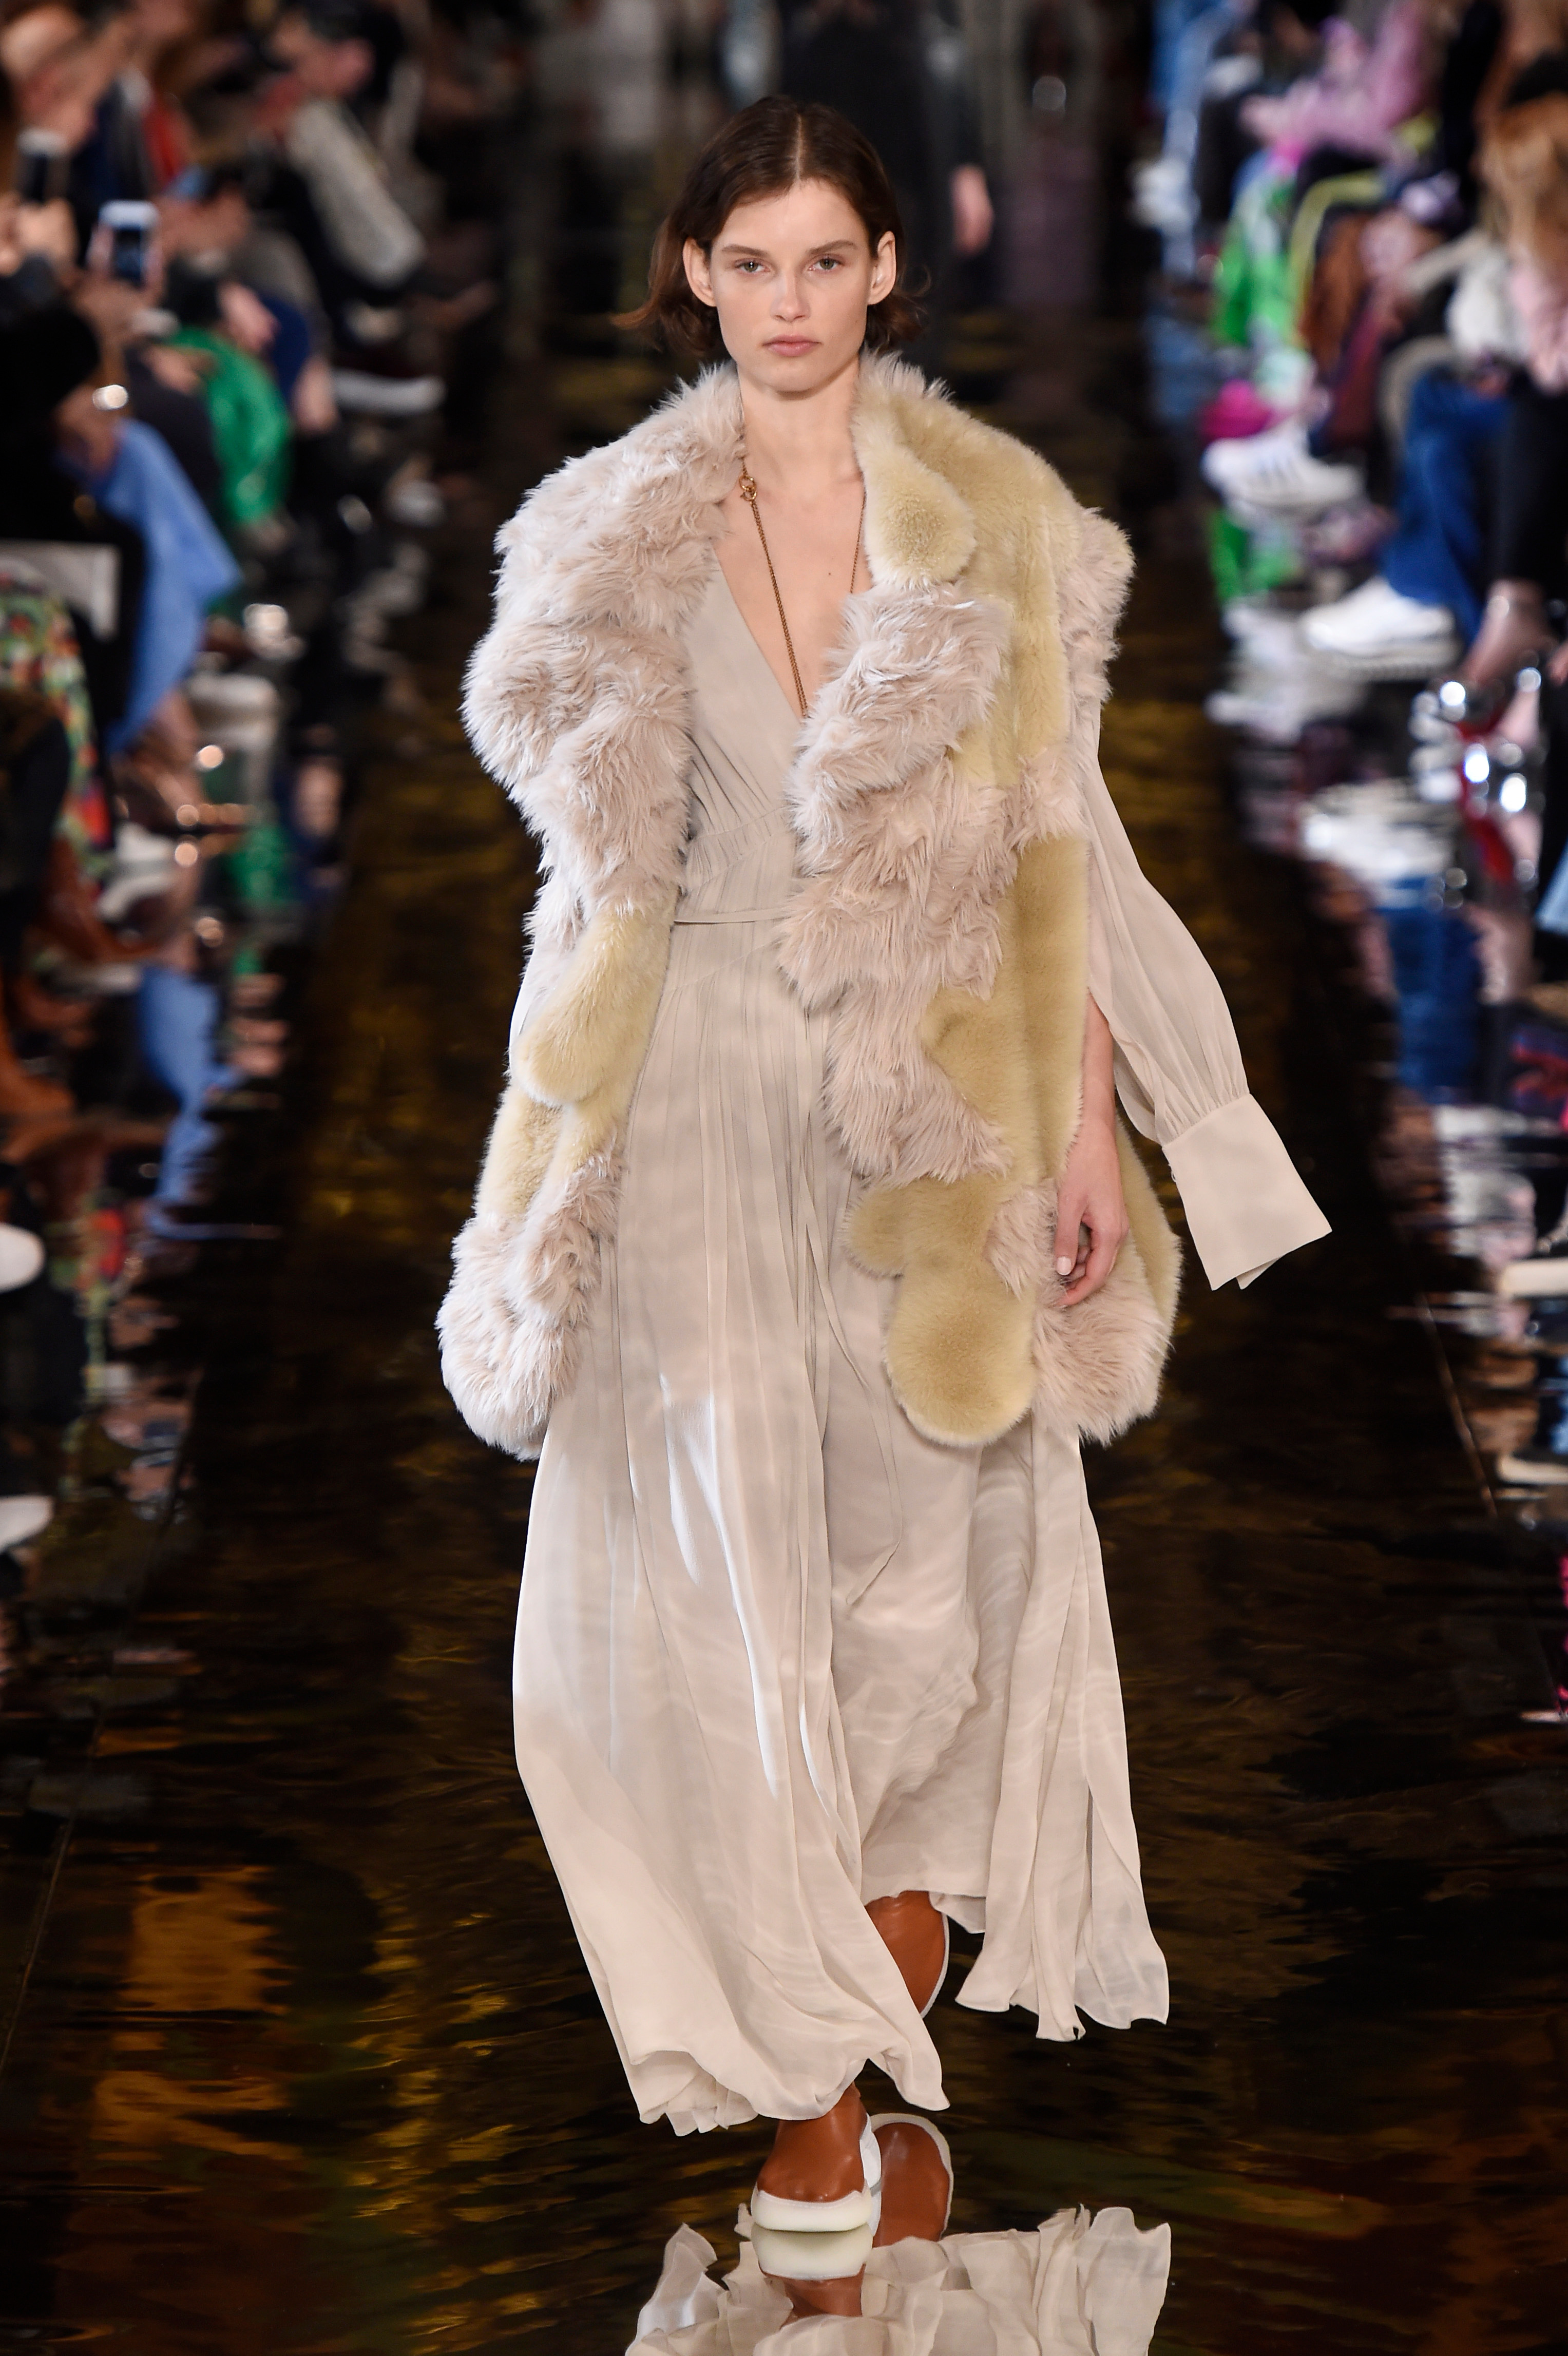 Model on the catwalkStella McCartney show, Runway, Fall Winter 2018, Paris Fashion Week, France - 05 Mar 2018